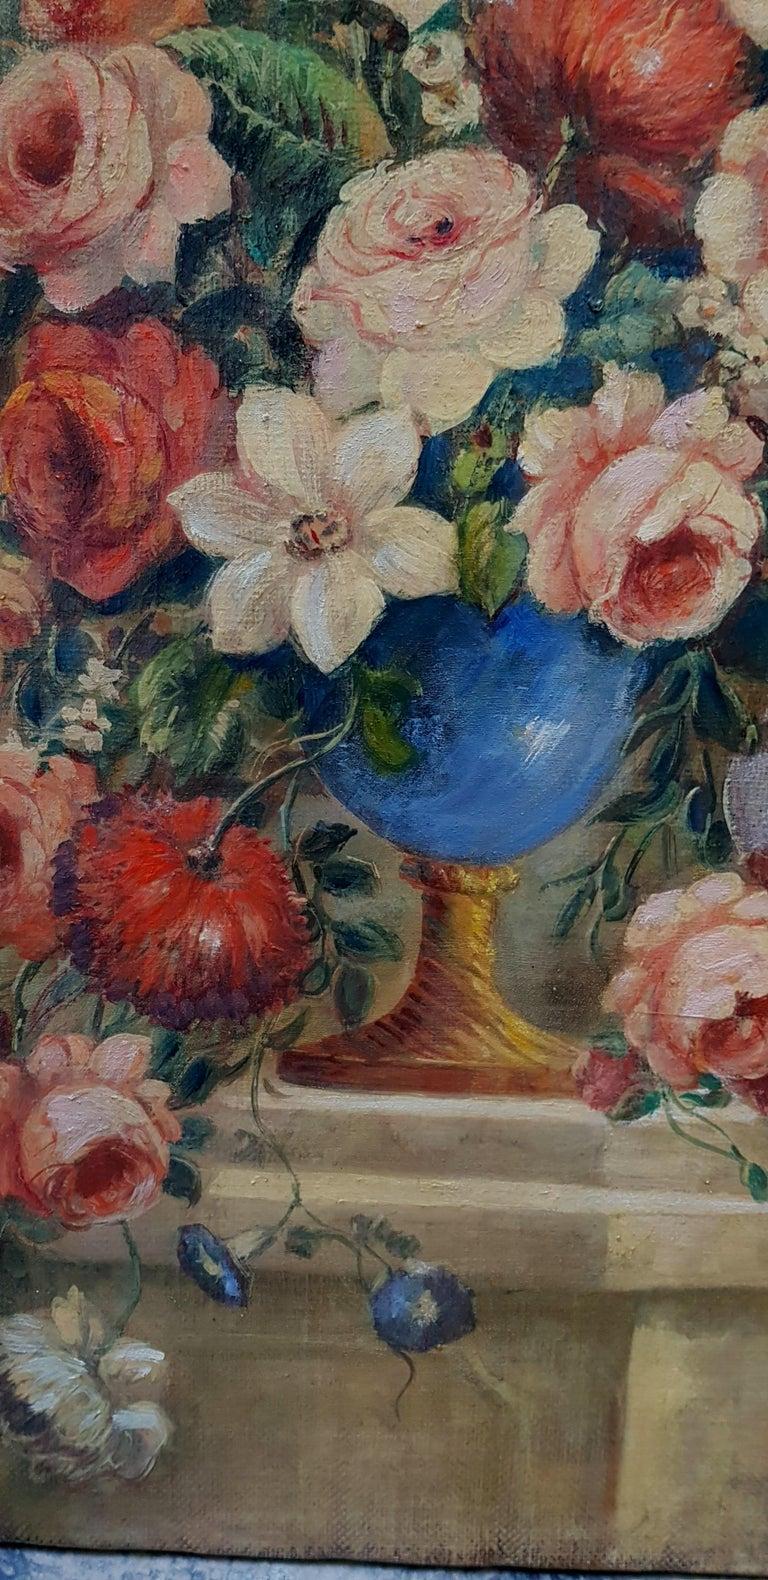 FLOWERS- In the Manner of  Gasparo Lopez dei Fiori - Neapolitan School - Paint - Old Masters Painting by Vittorio Landi